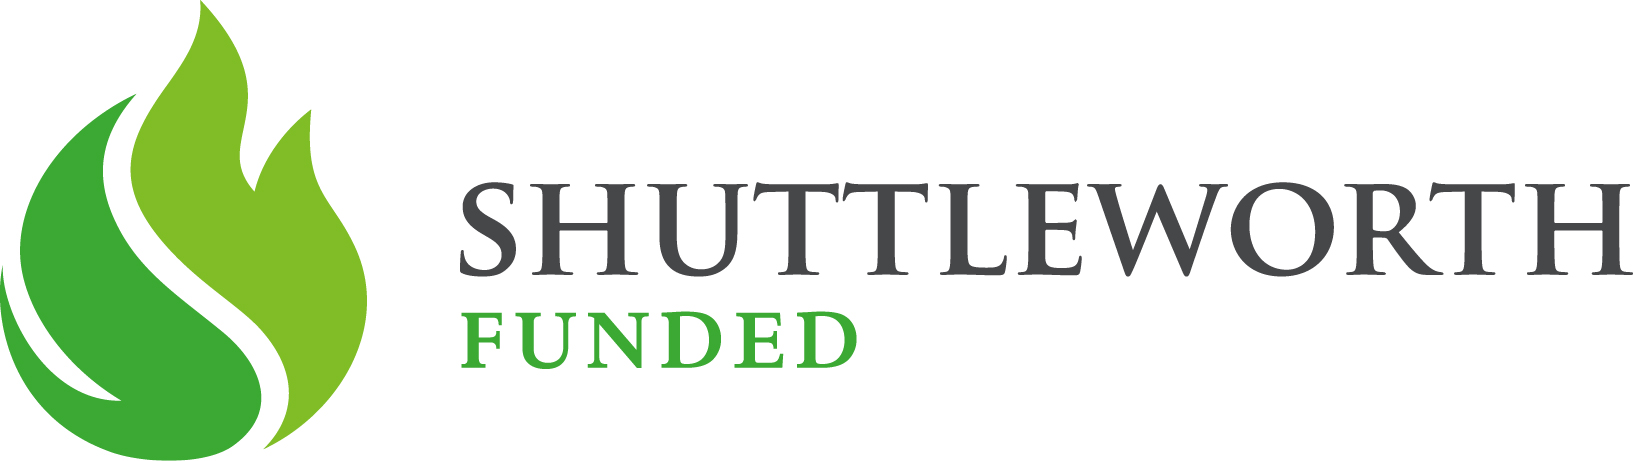 Shuttleworth Funded